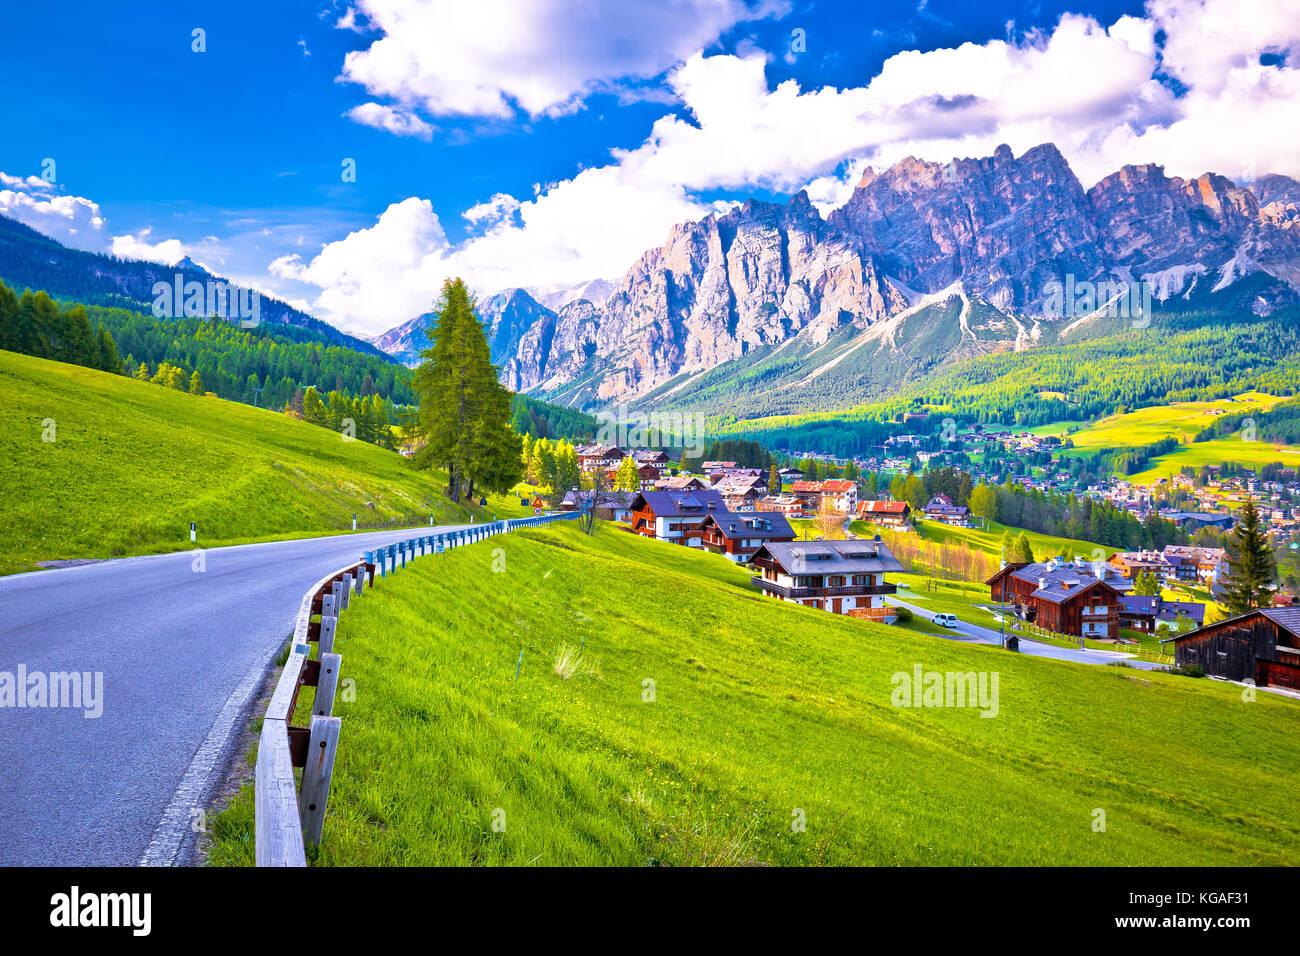 Road to Cortina d' Ampezzo in Dolomites Alps, Veneto region of Italy - Stock Image